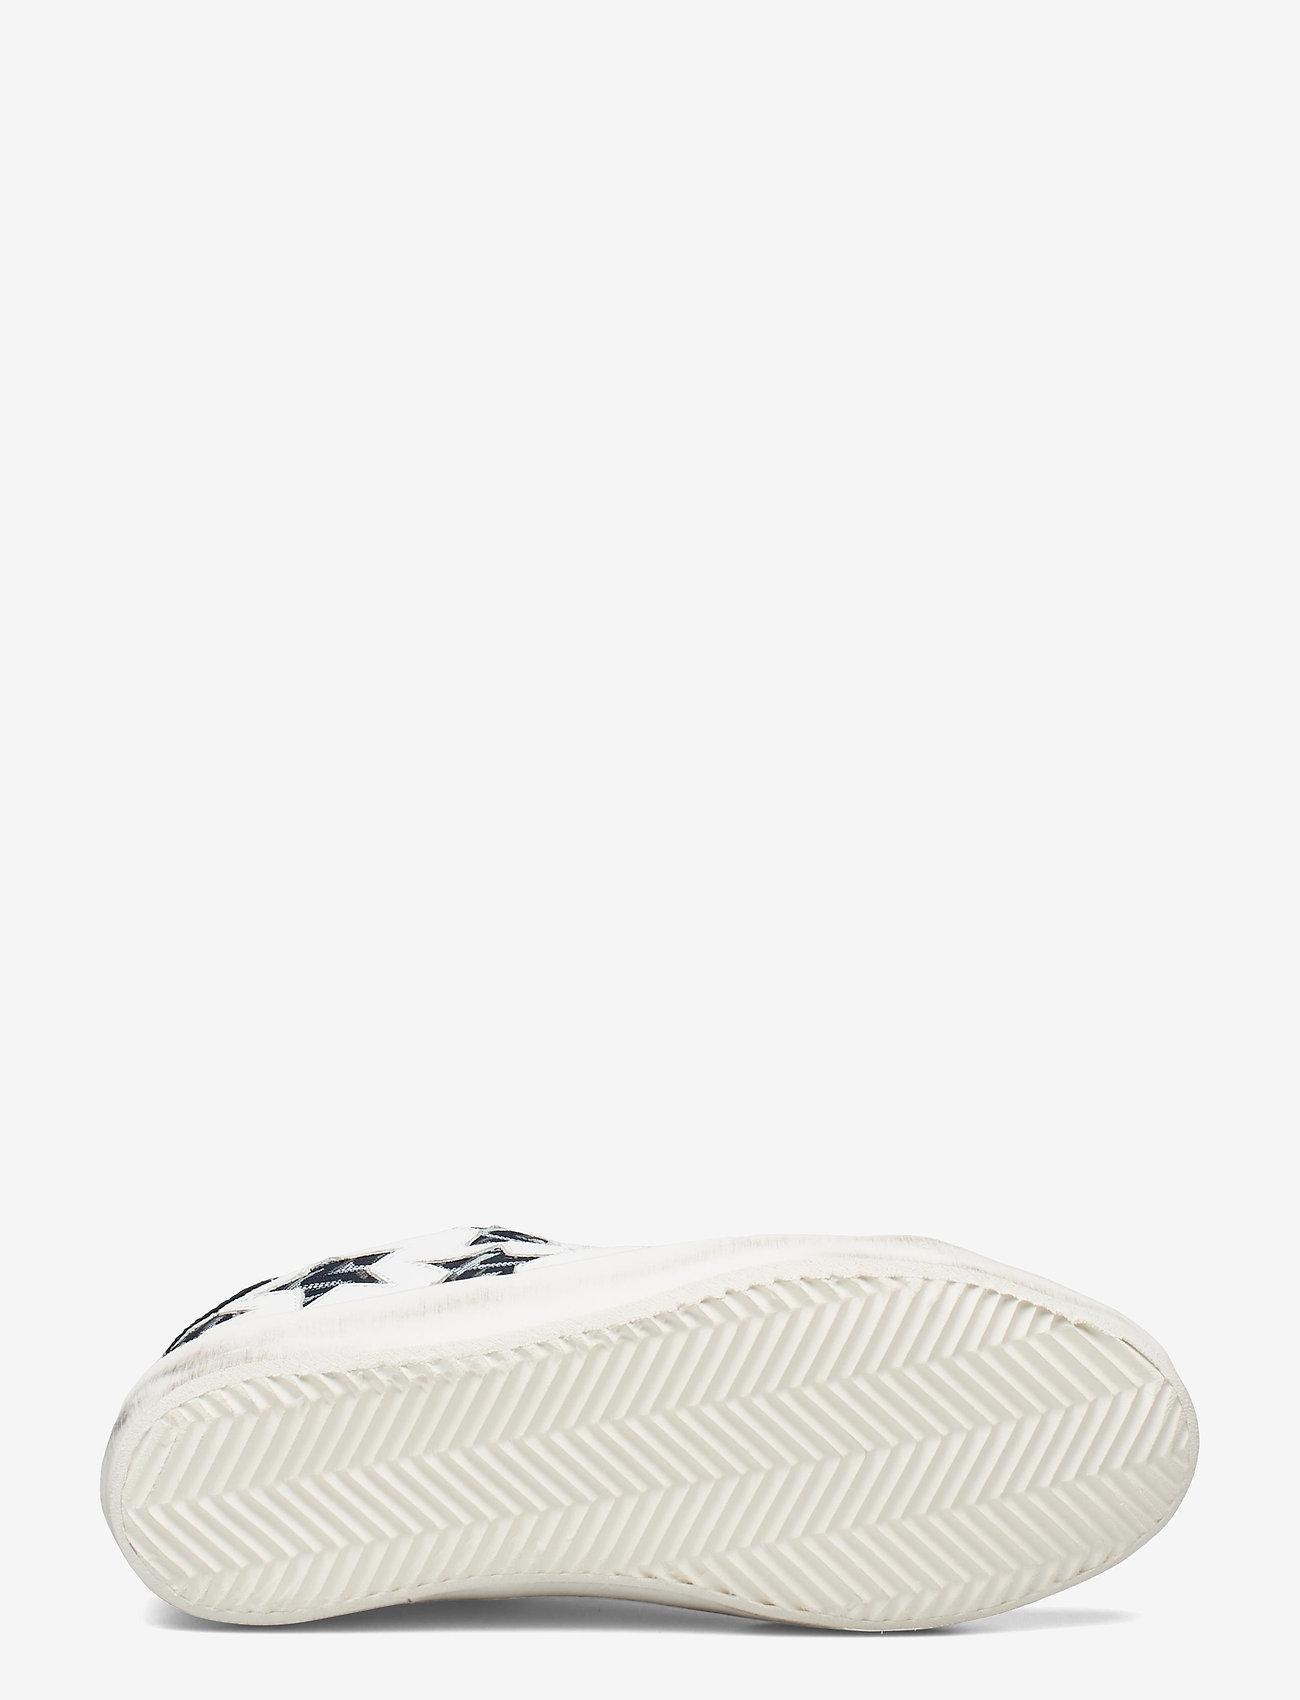 Zadig & Voltaire - ZADIG USED STARS MONOGRAM - lave sneakers - blanc acier - 4